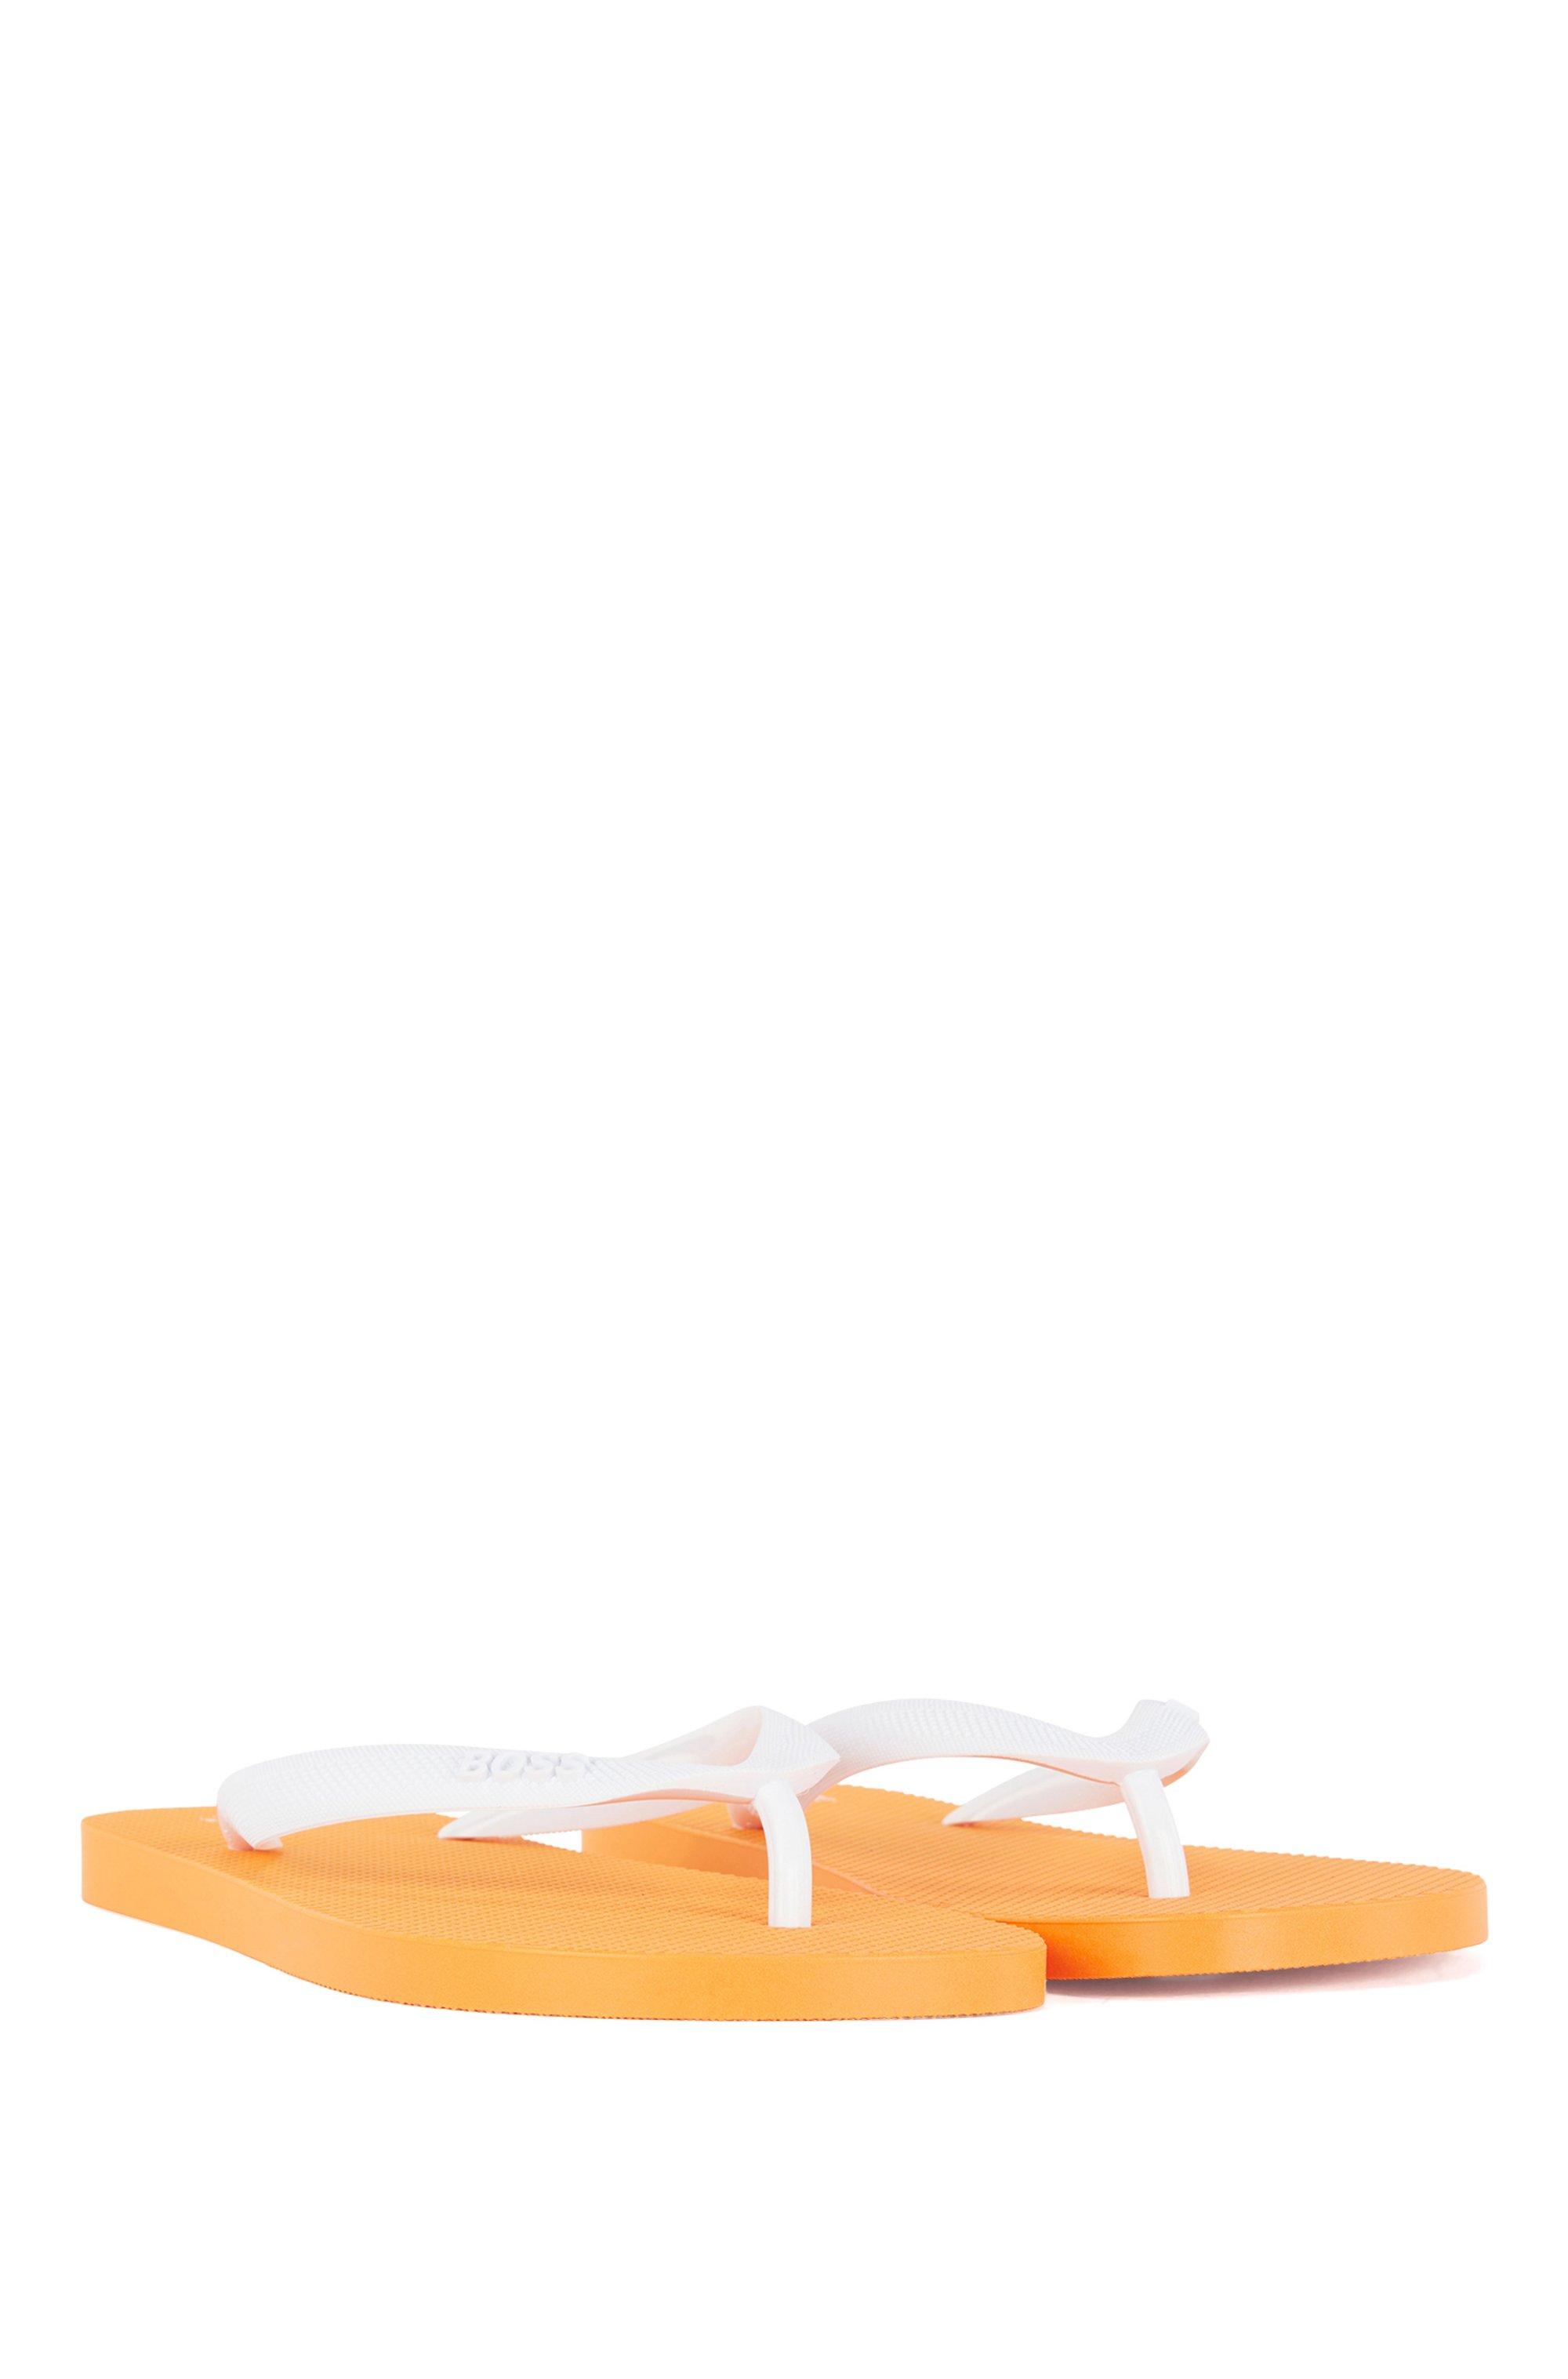 Rubber flip-flops with new-season logo